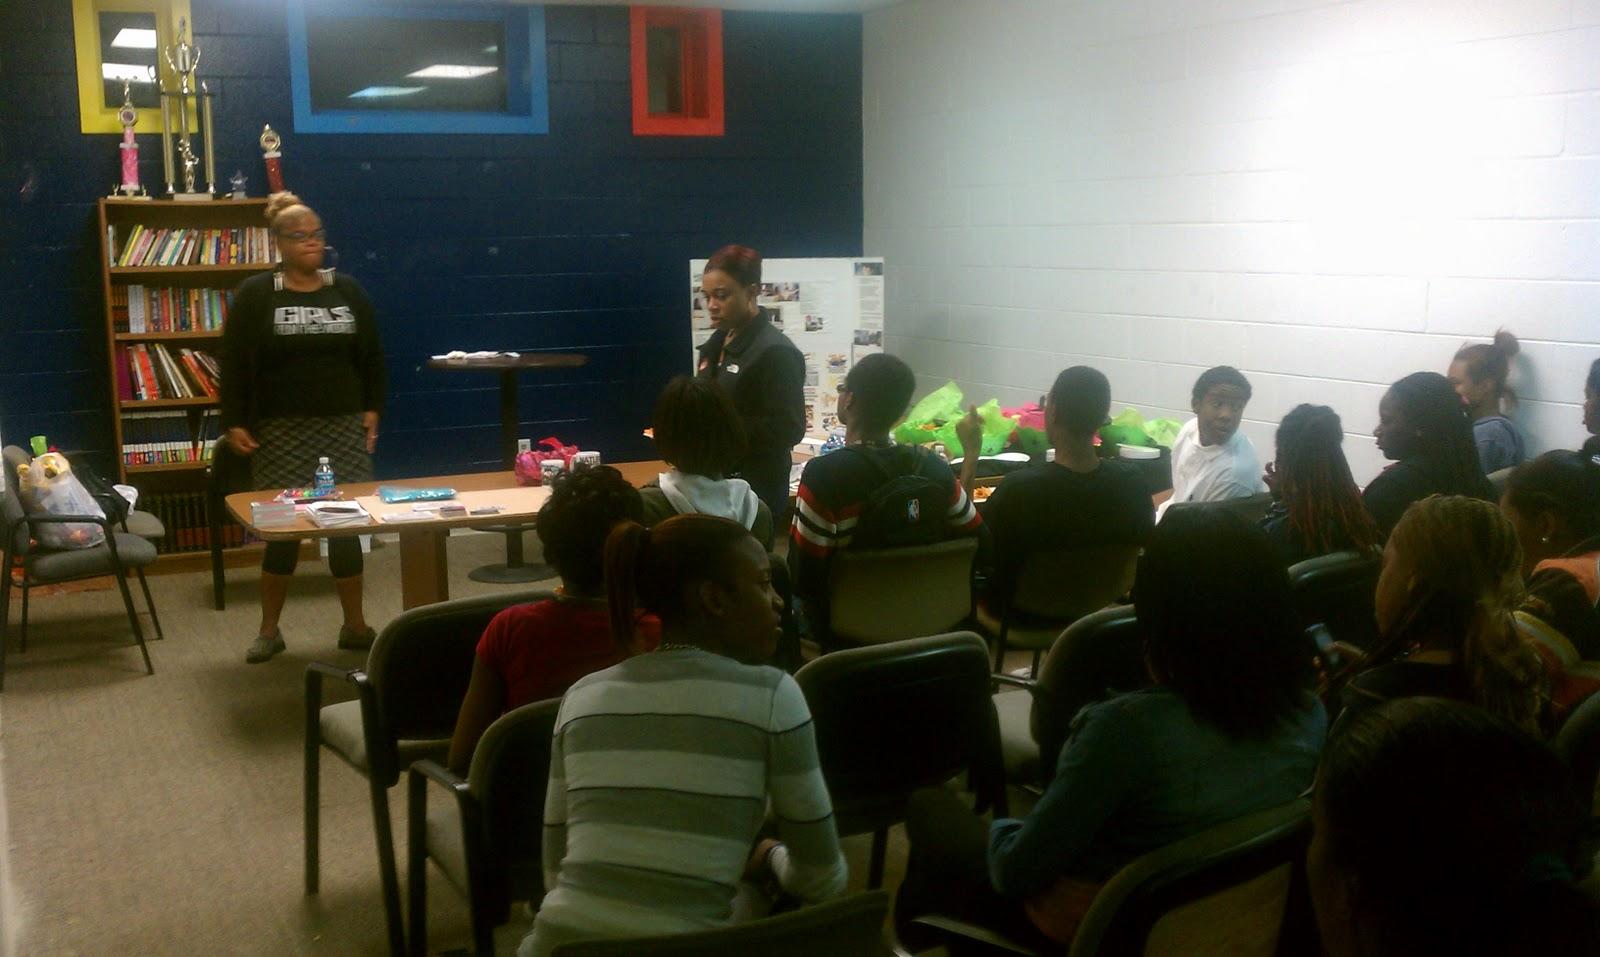 Teen Center Session Participants